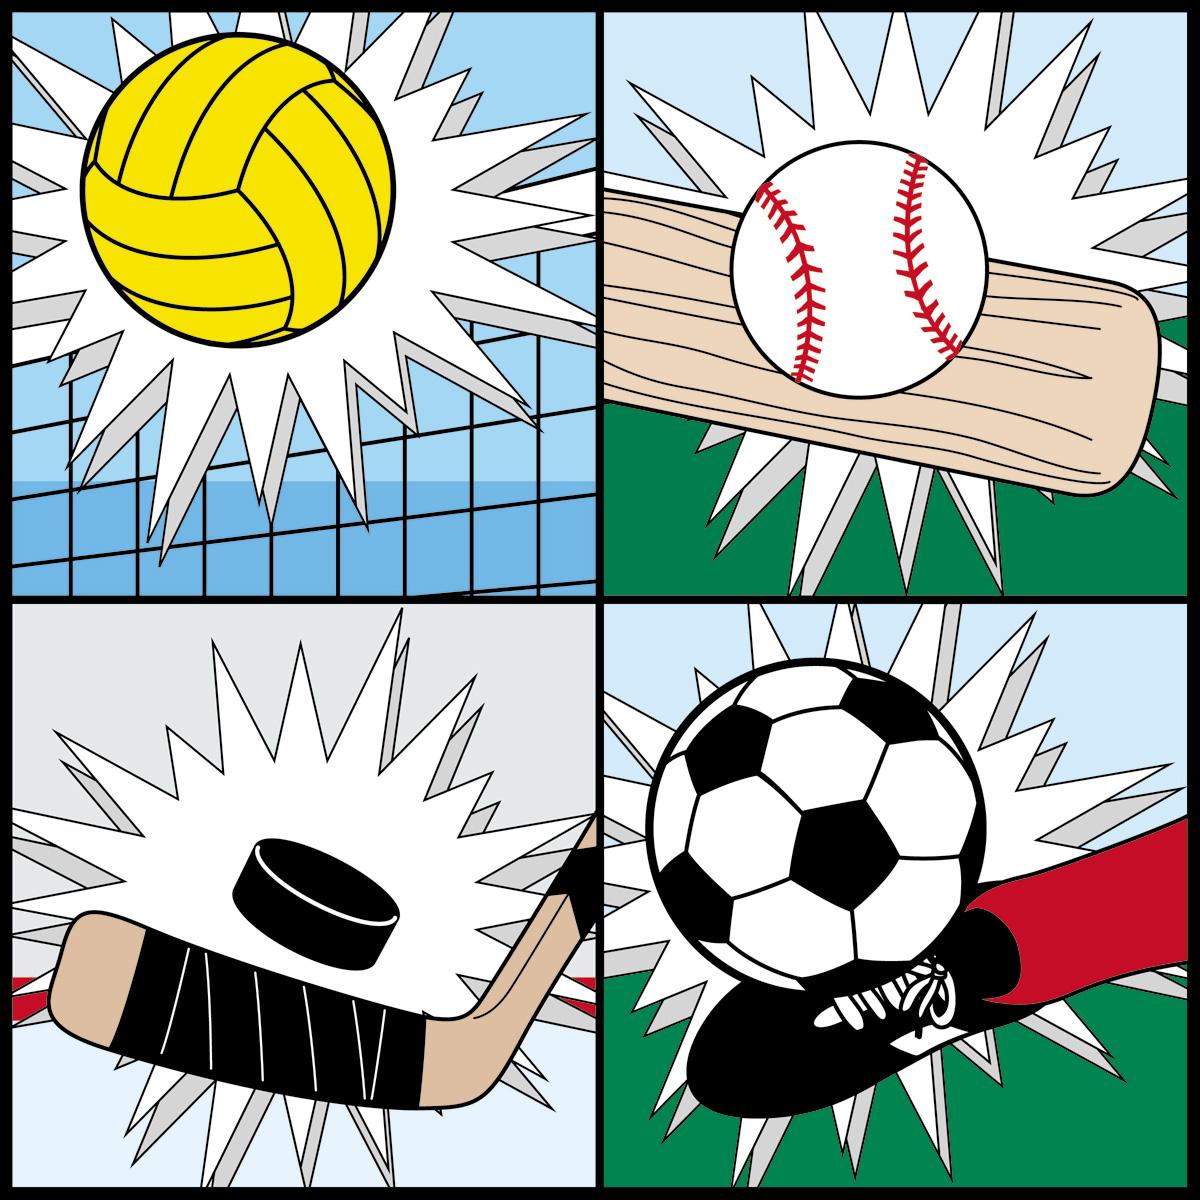 clipart sport free - photo #40